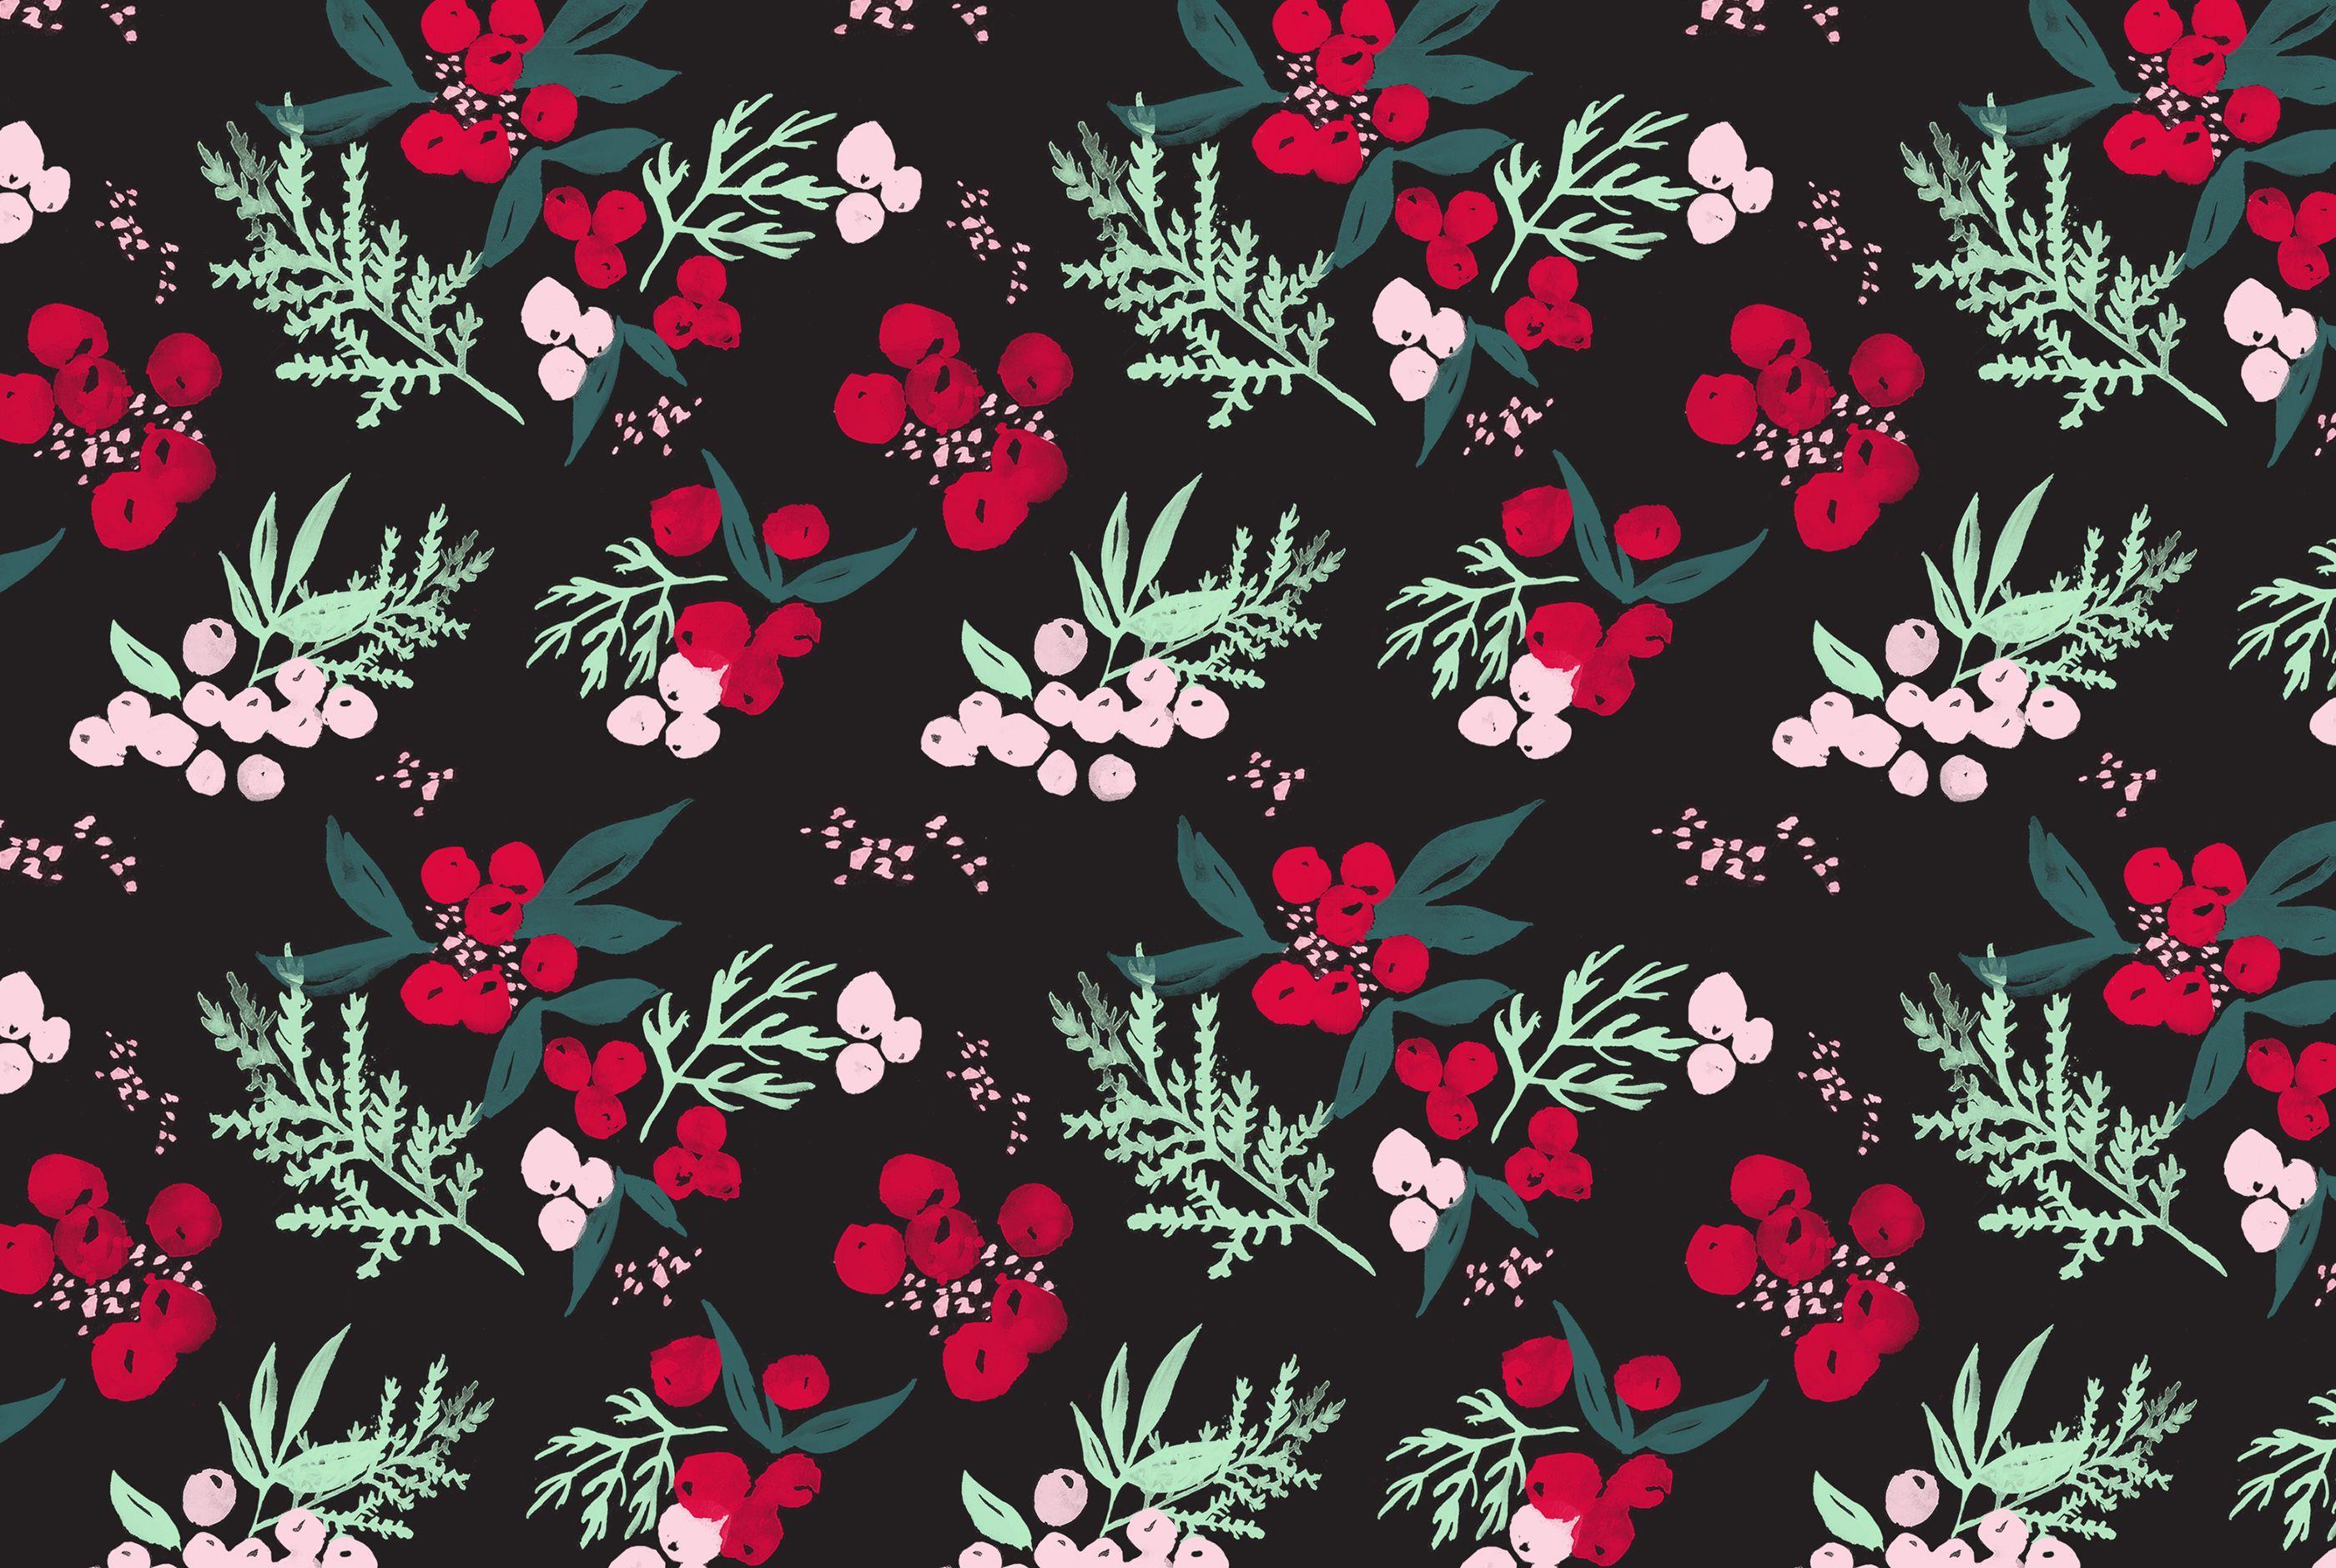 Pc Wallpapper Floral Wallpaper Desktop Desktop Wallpaper Design Floral Wallpaper